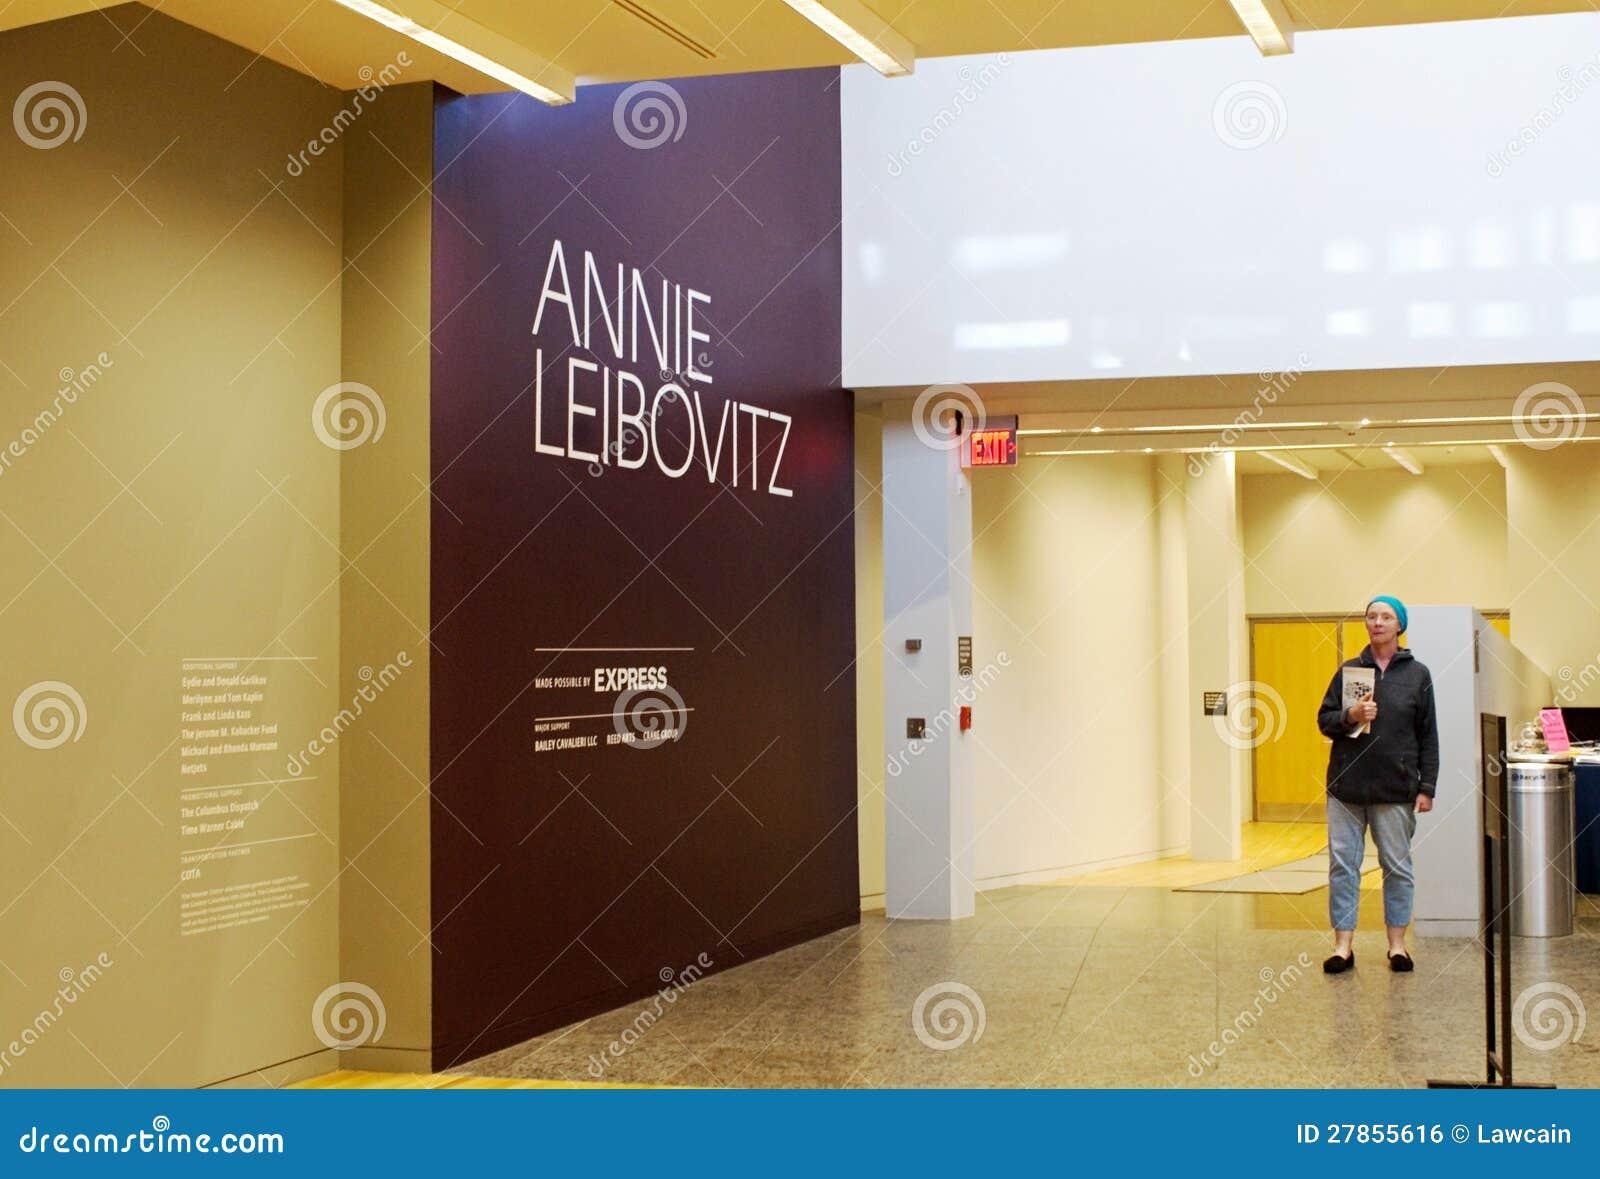 Annie Wystawa Leibovitz